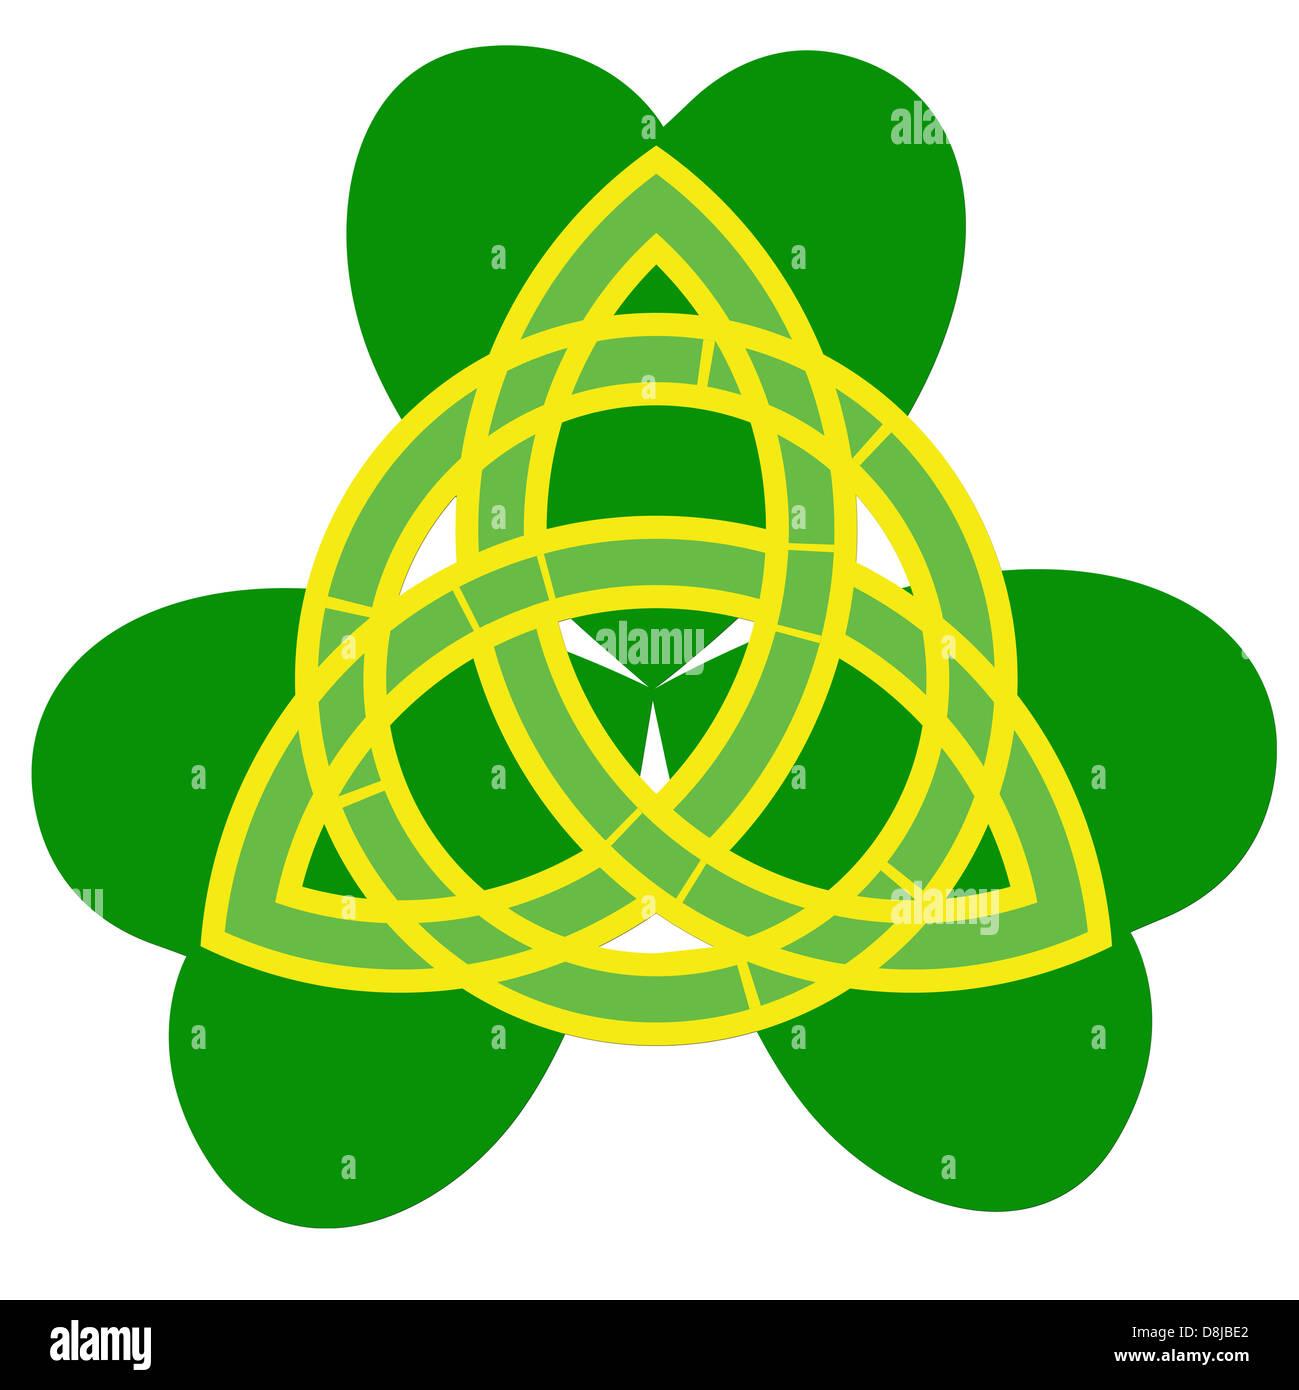 christian celtic trinity symbol - Stock Image